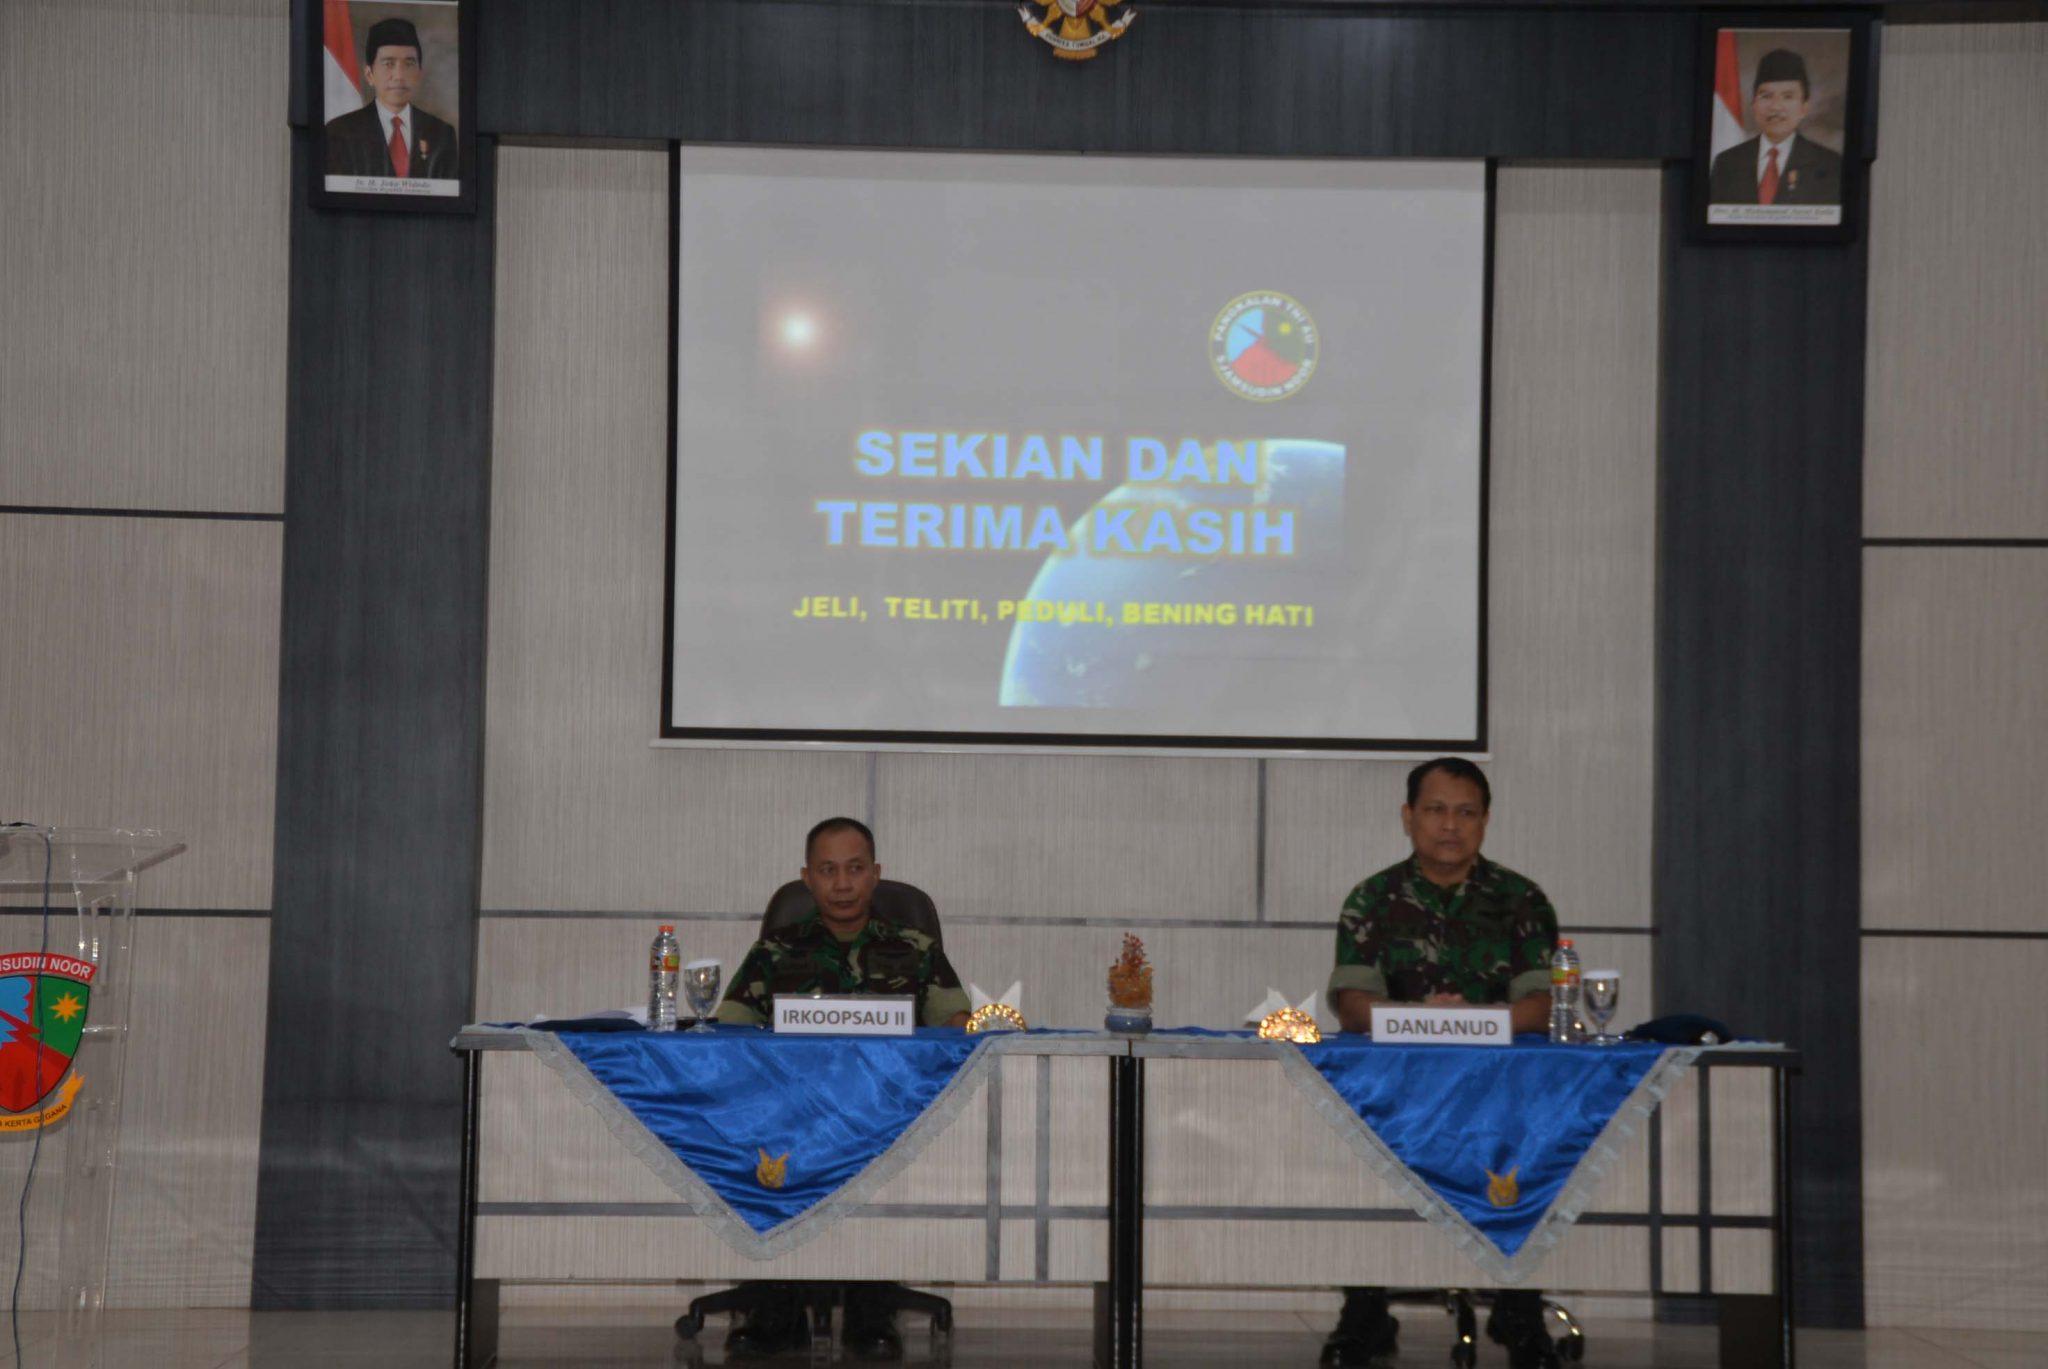 Pengawasan Dan Pemeriksaan Irkoopsau II di Lanud Sjamsudin Noor